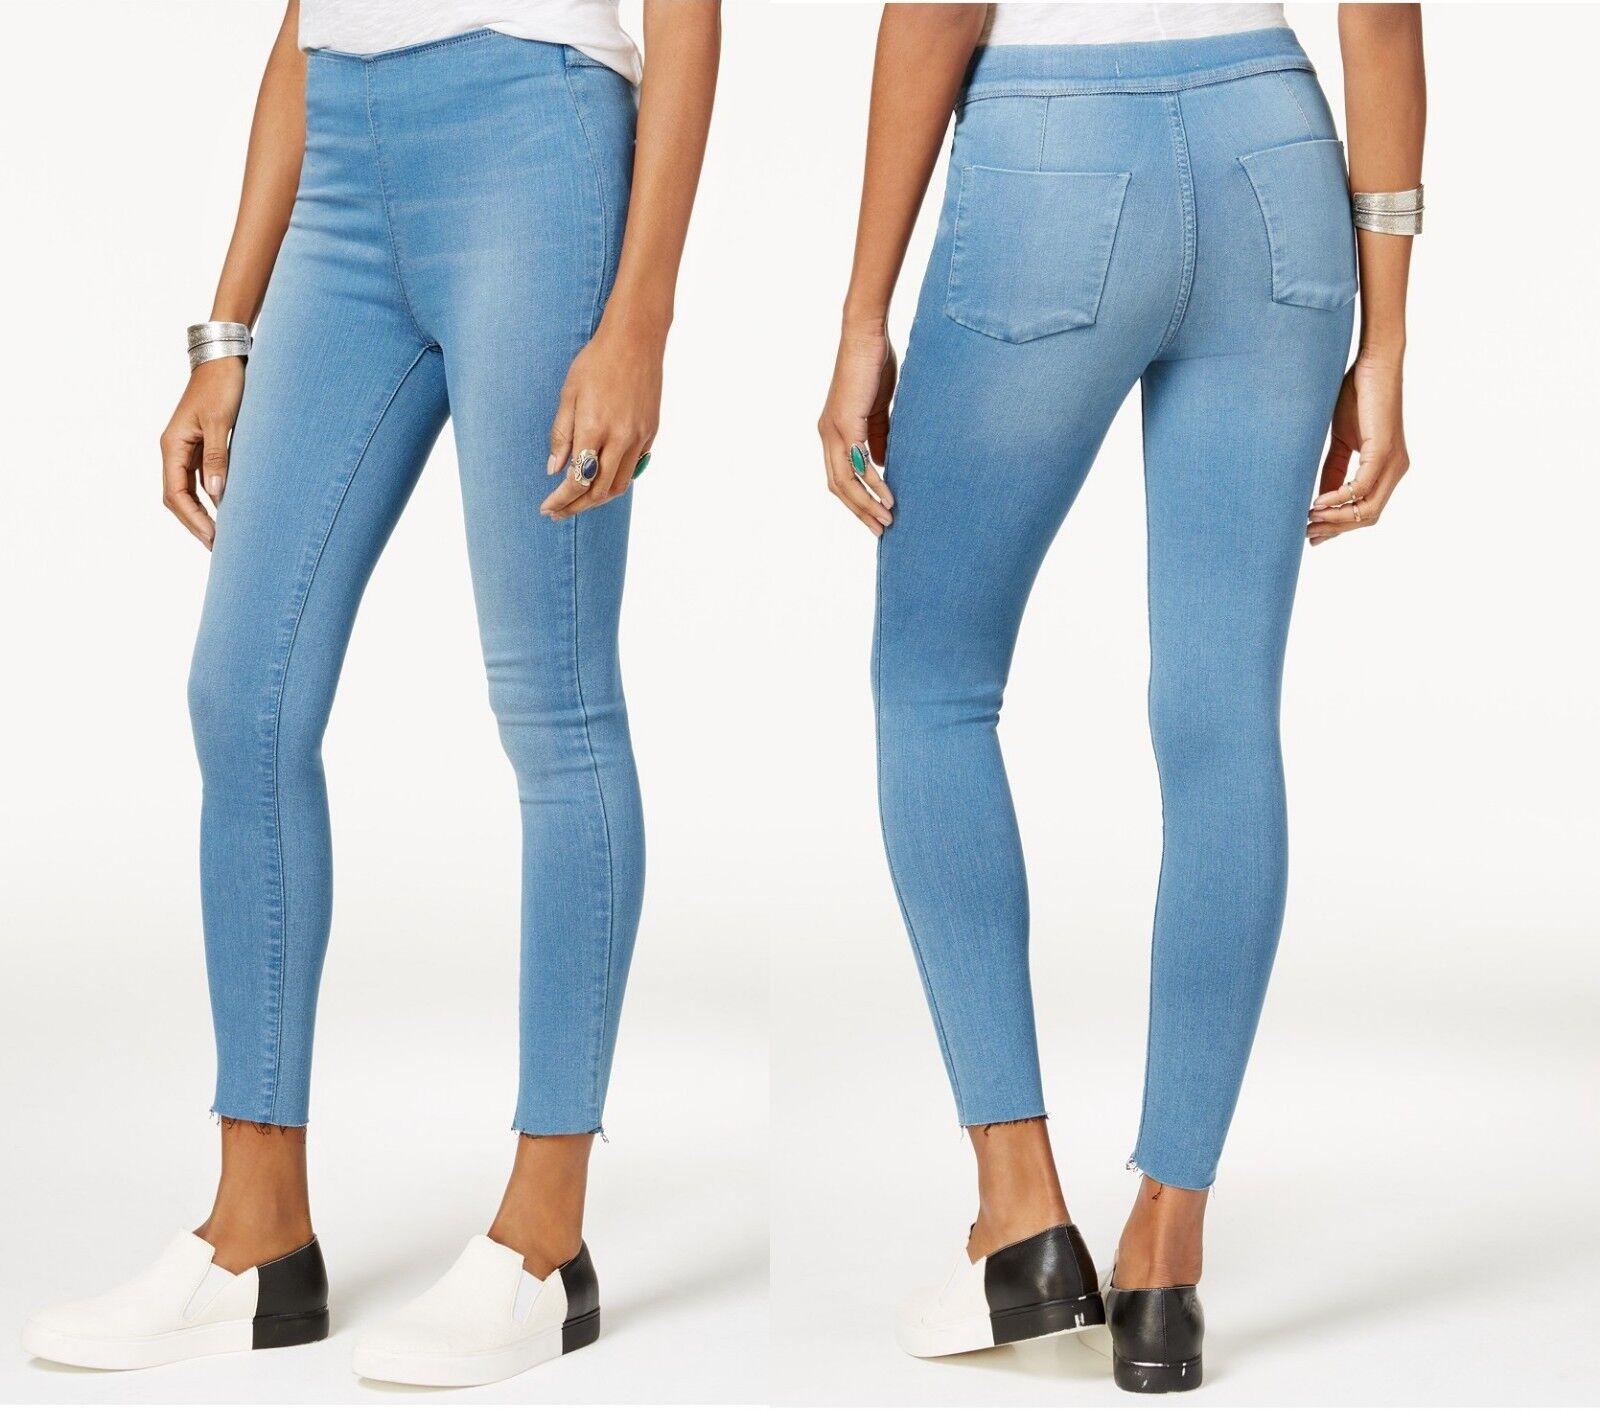 FREE PEOPLE Womens Easy Goes Jeggings Skinny Jeans High Waist Legging L bluee